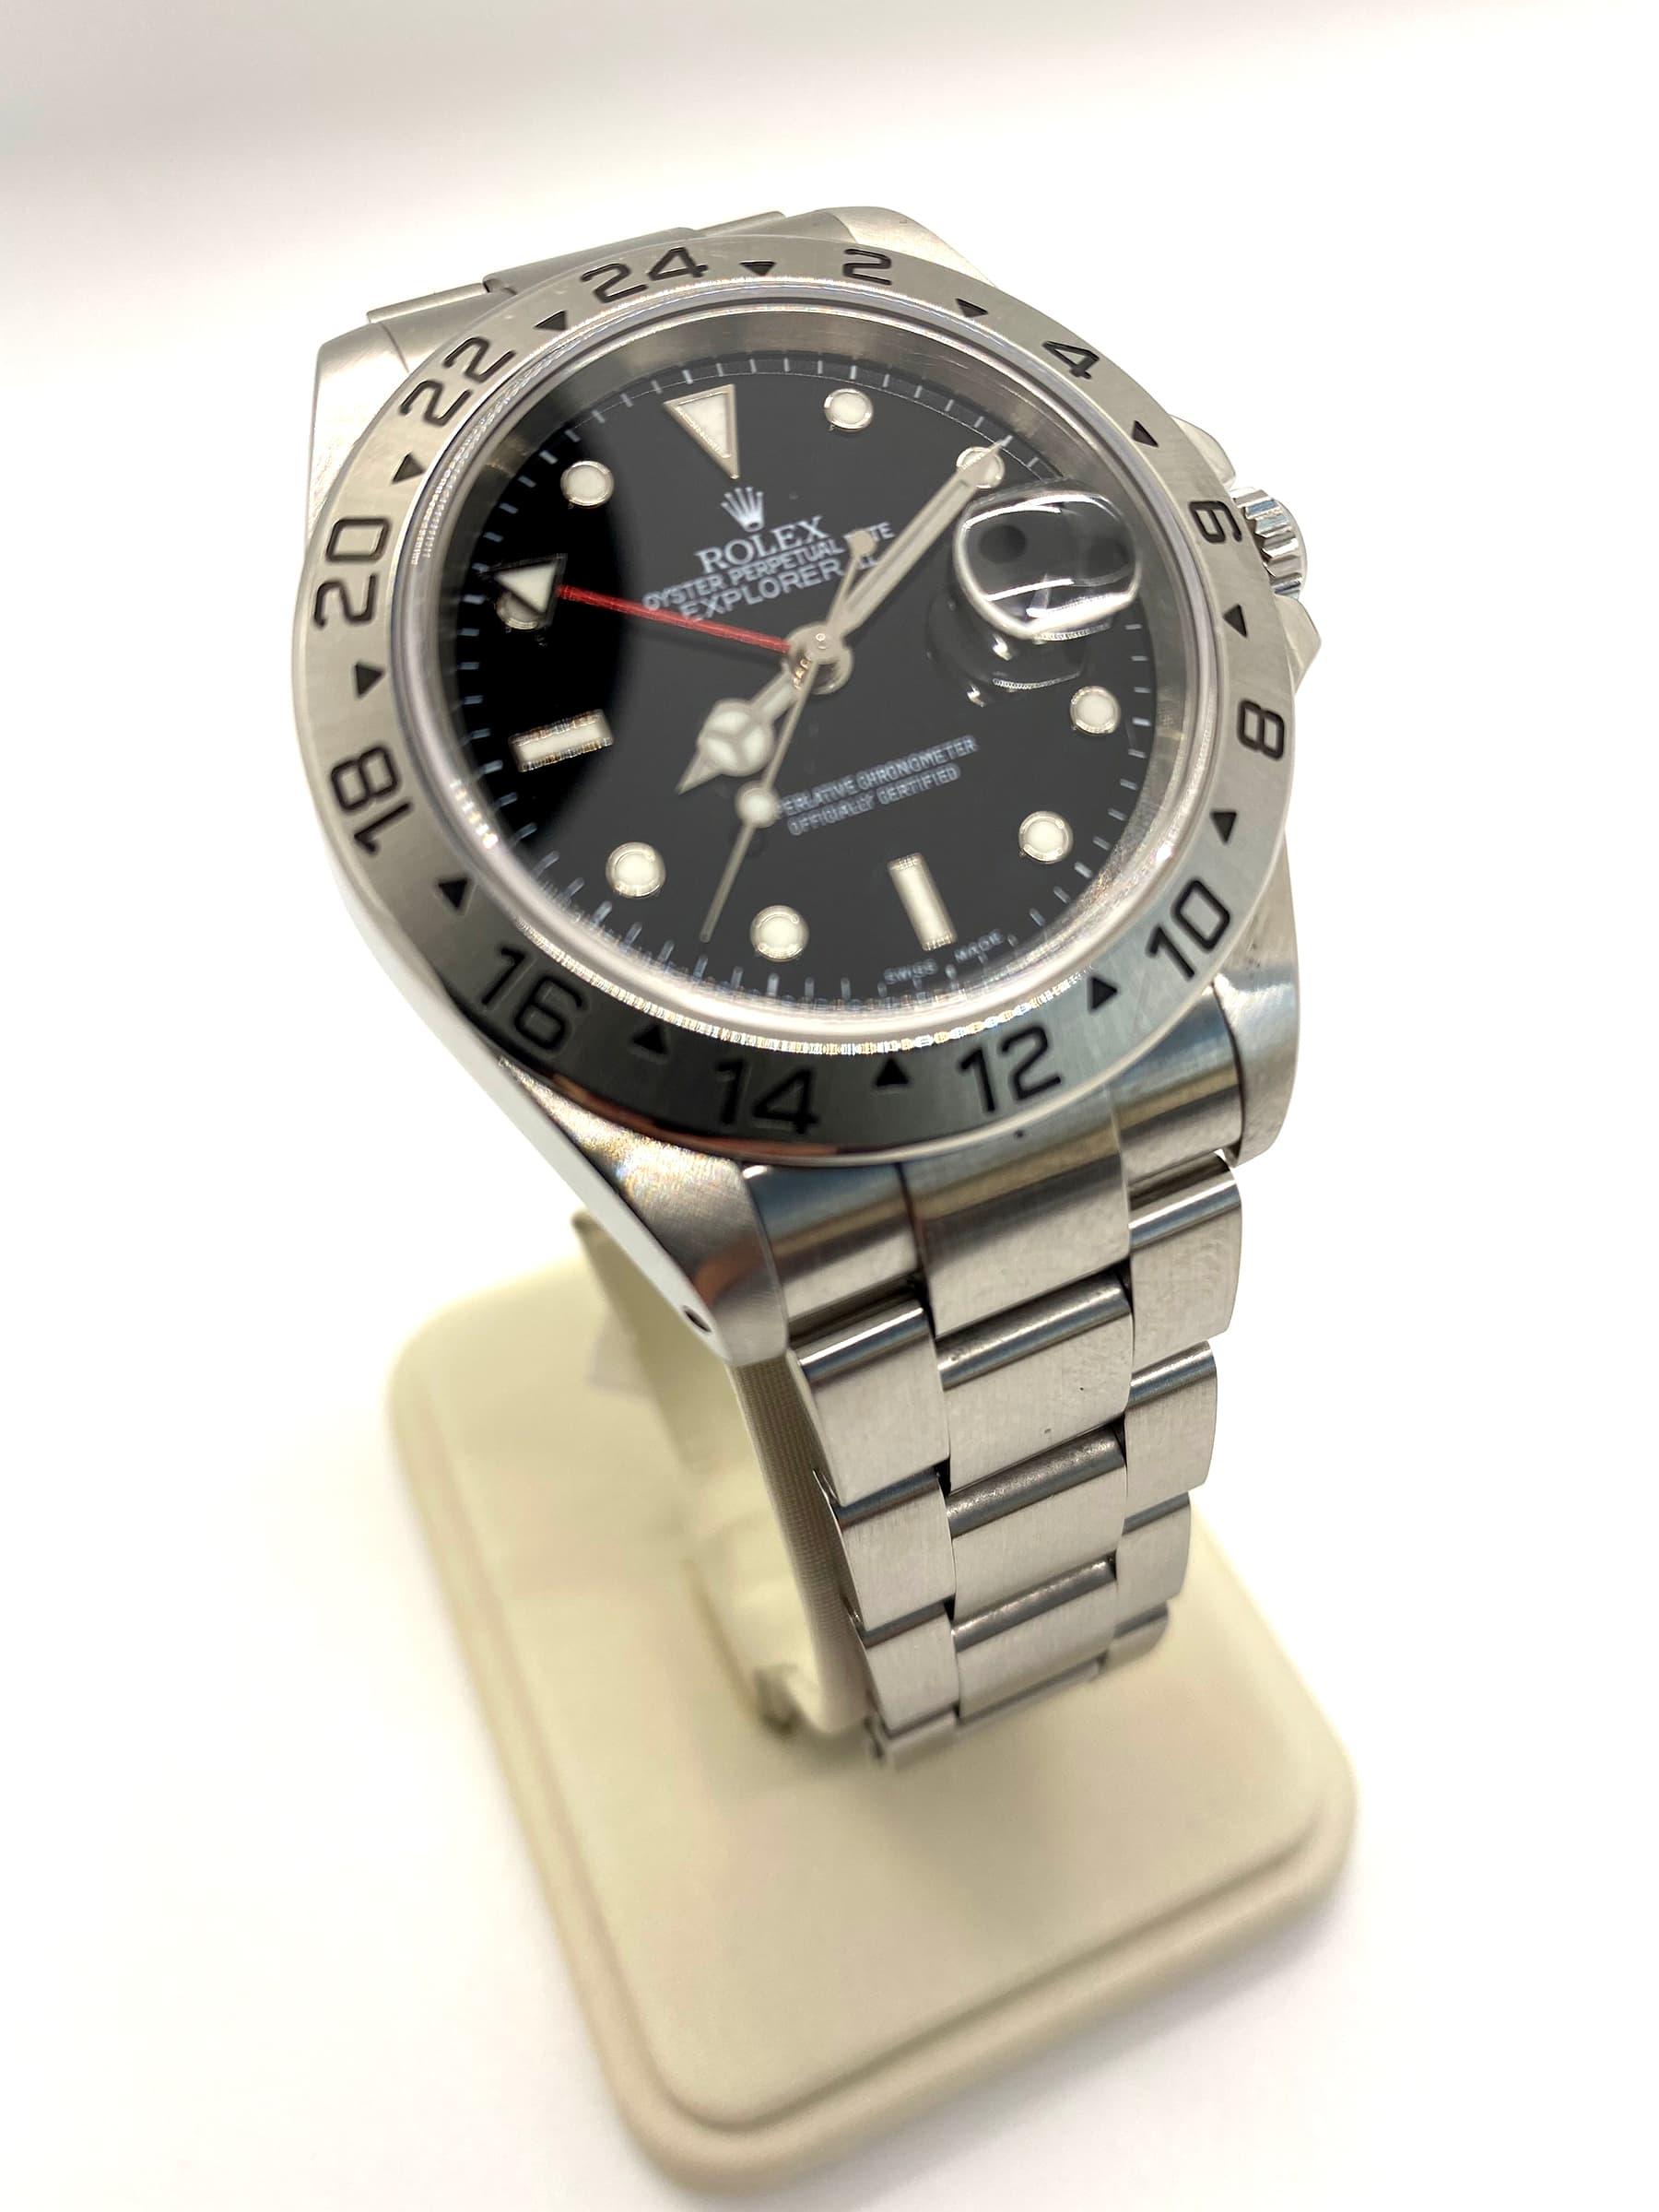 Explorer II 16570 Men's Rolex Watch with Papers Only